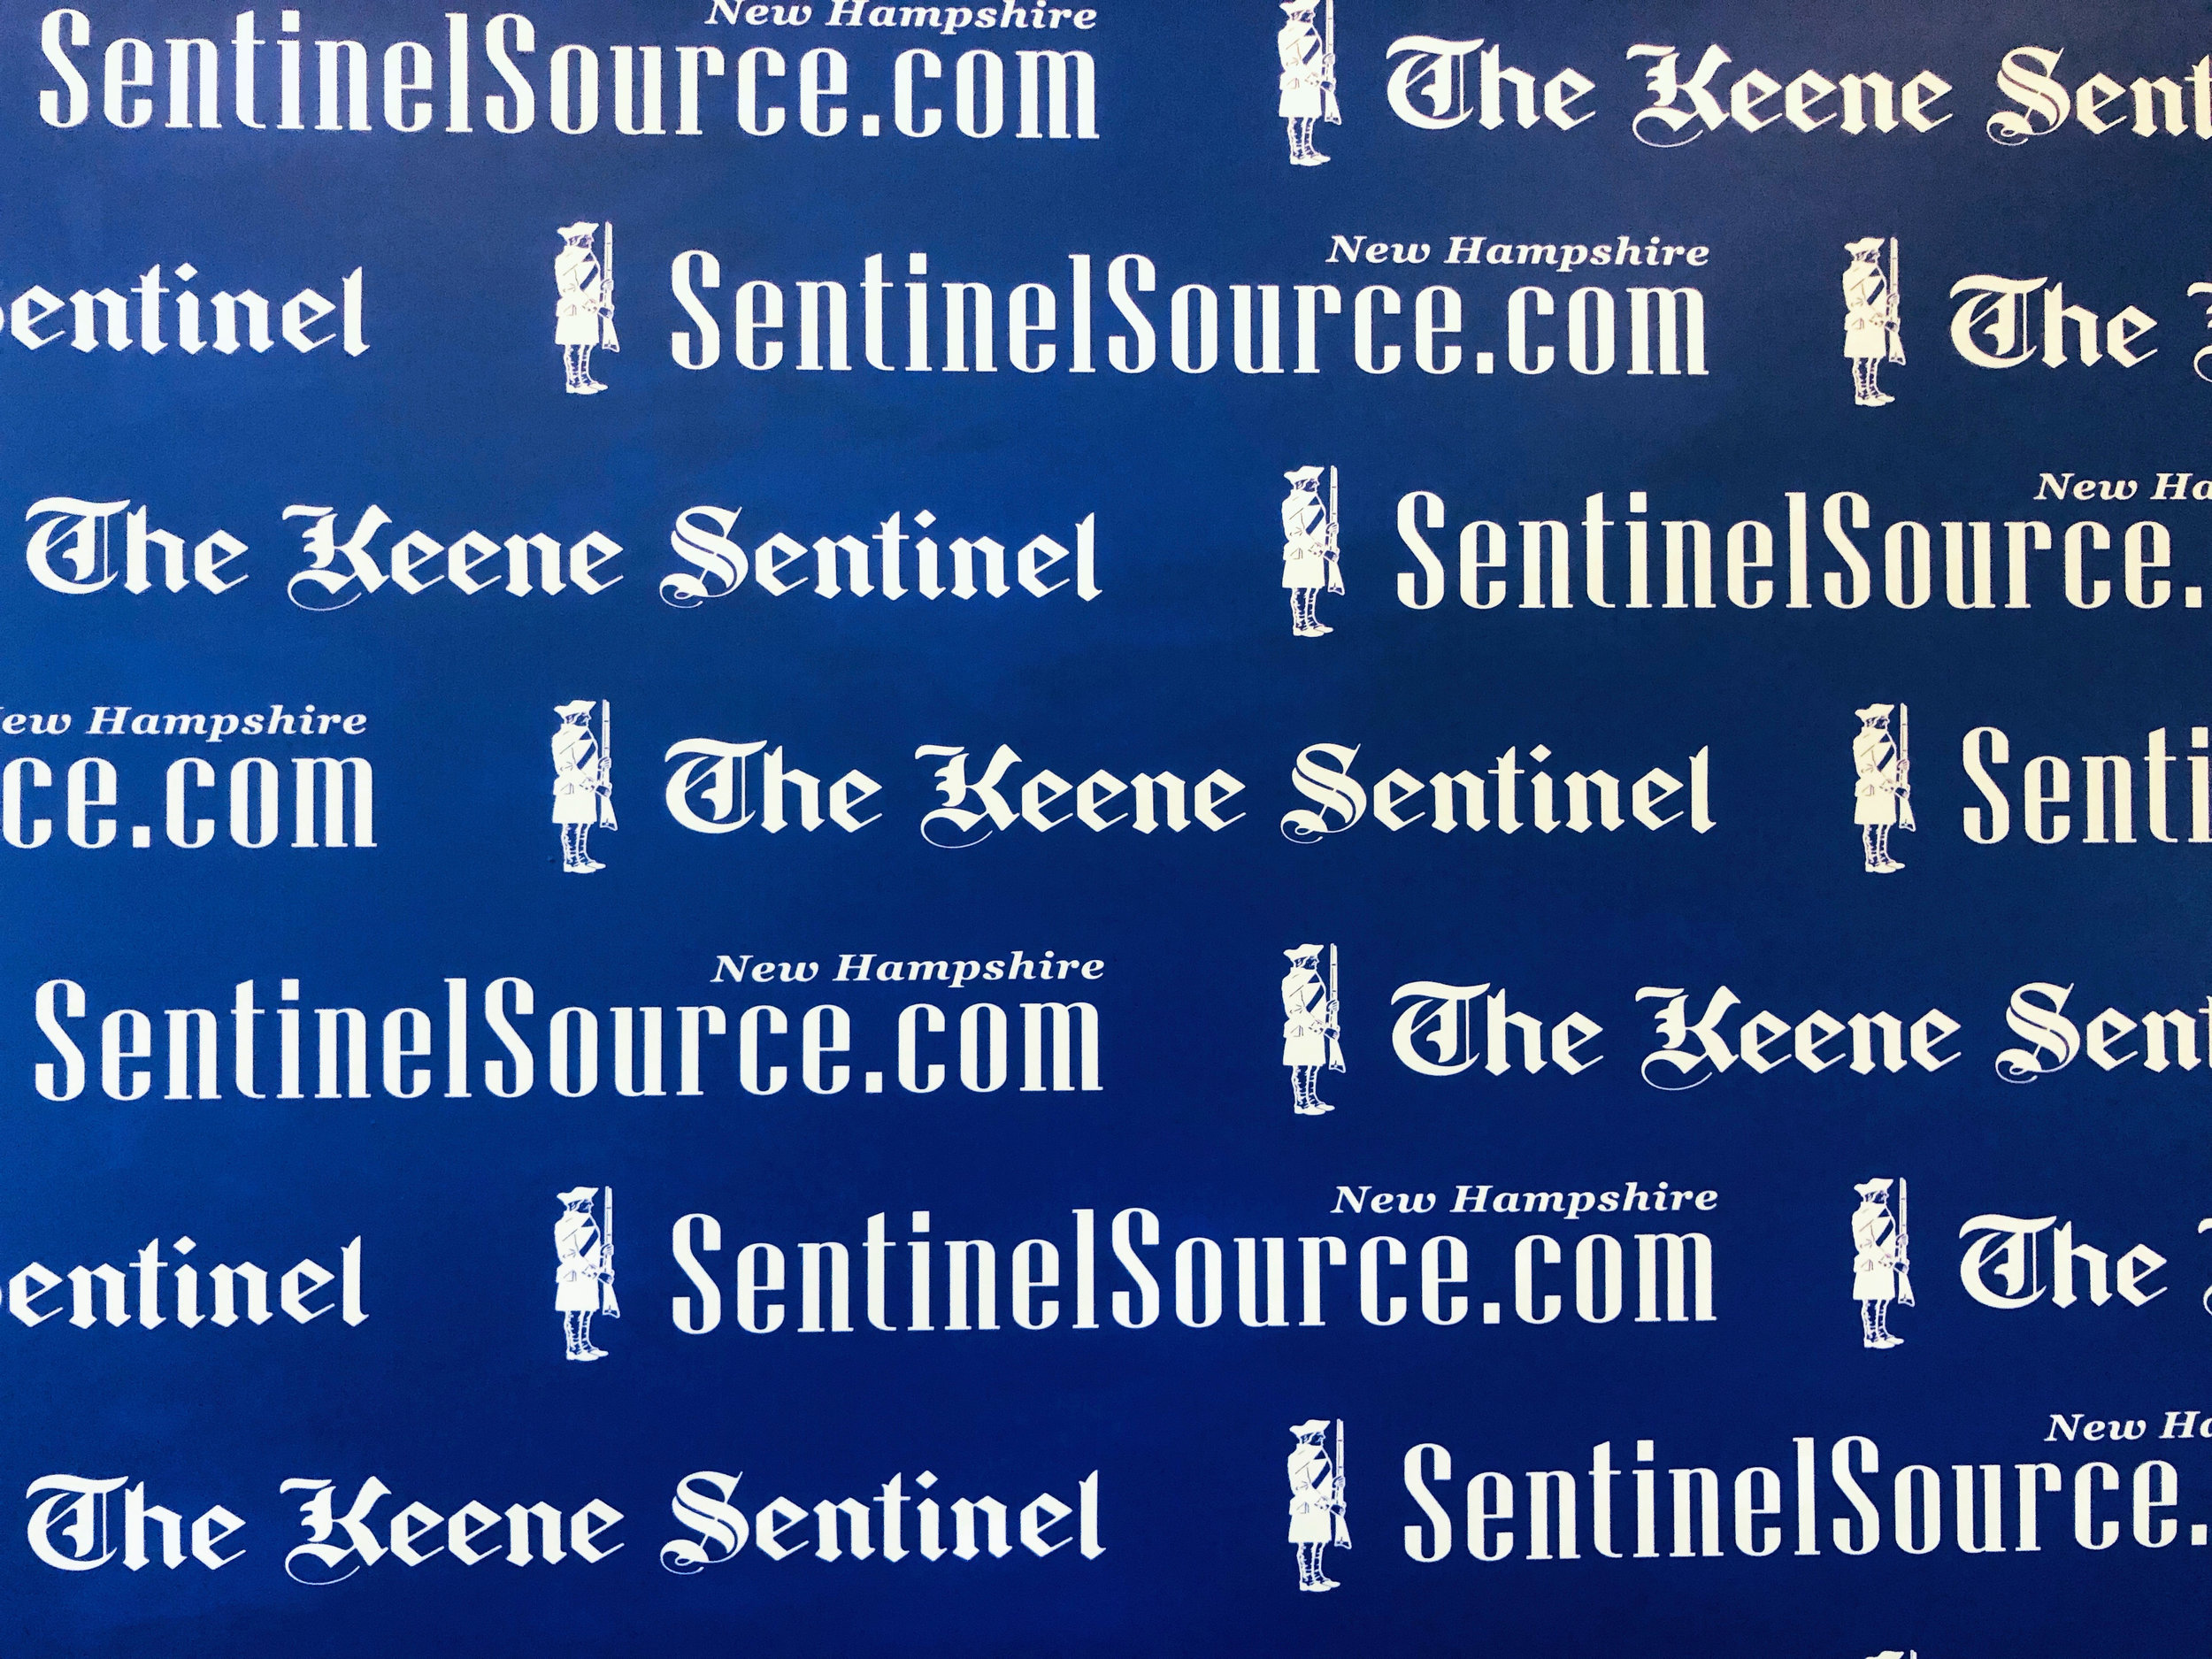 sentinel-bigboard-1.jpg